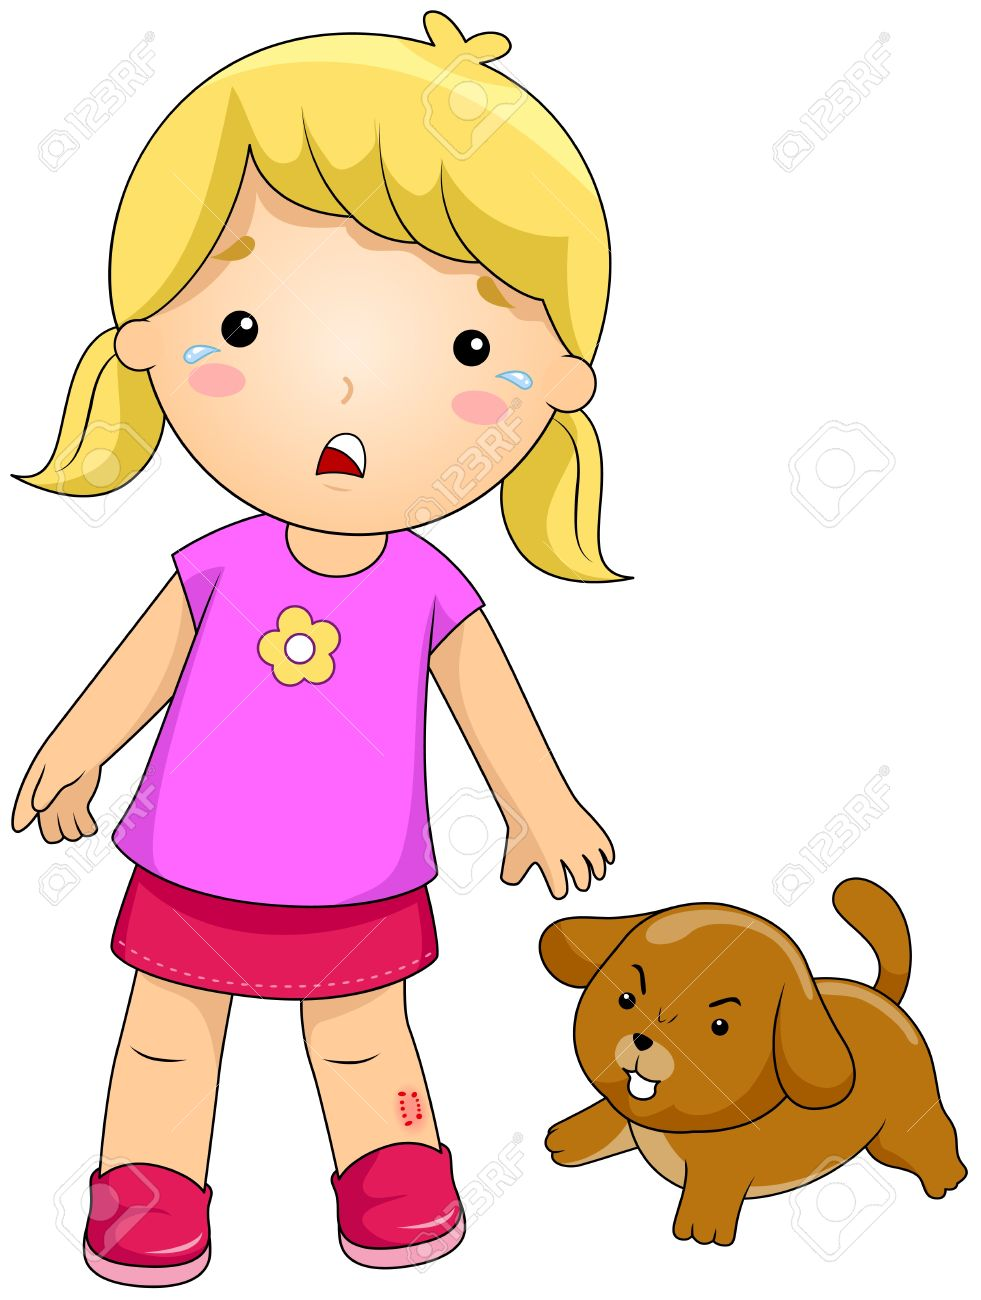 Illustration of a Girl Bitten by a Dog Stock Illustration - 8329096